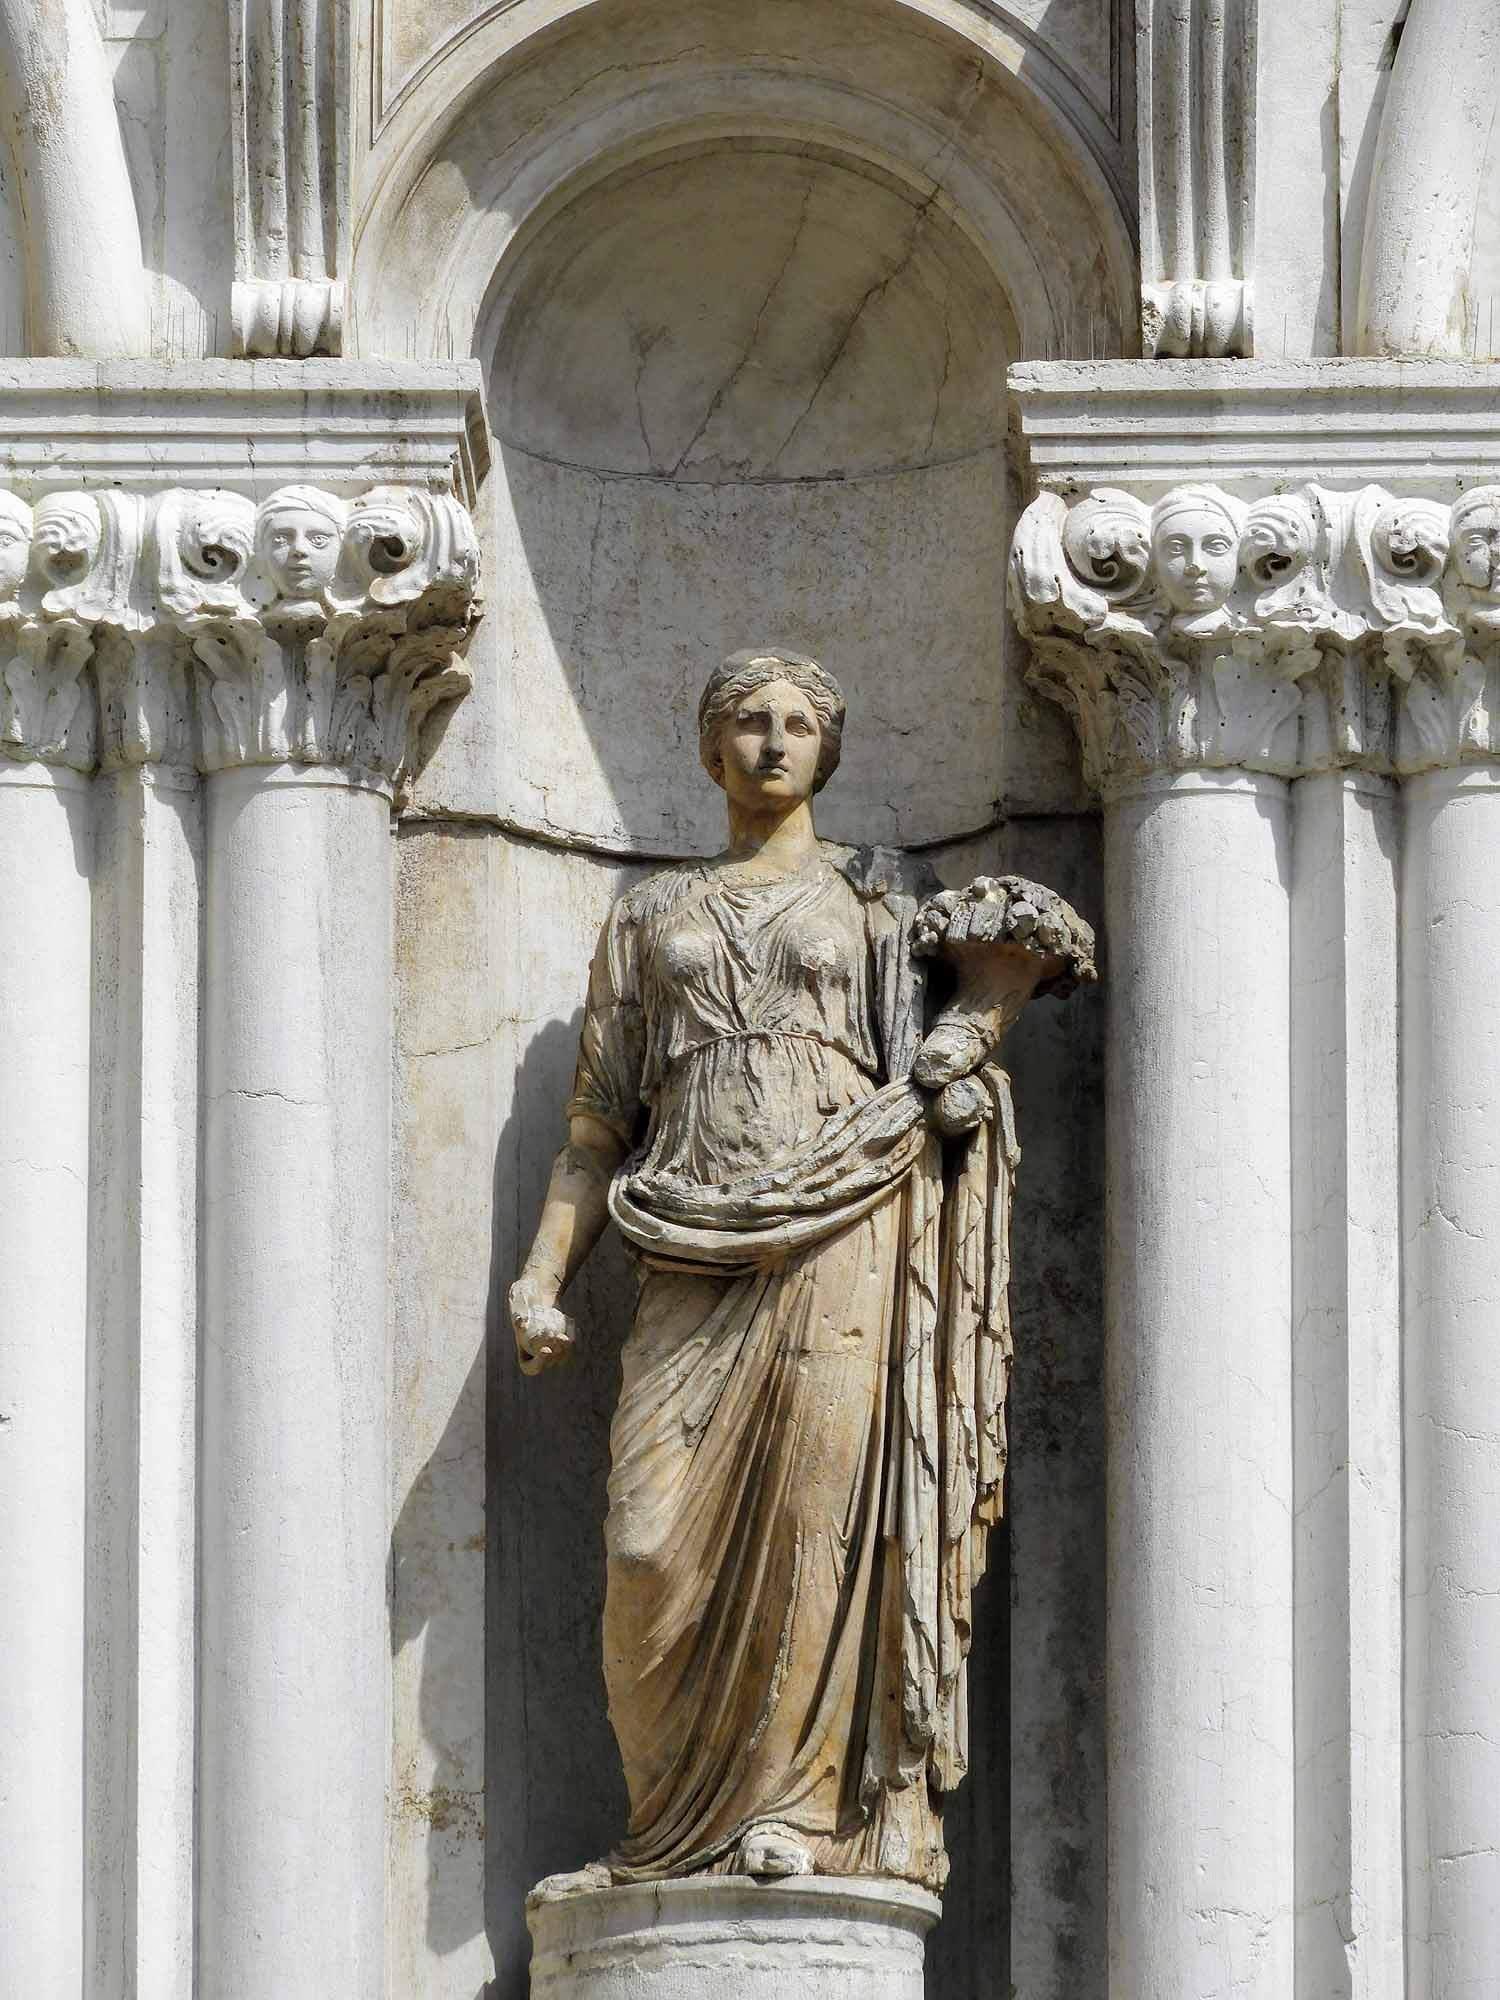 italy-italia-venice-palazzo-ducale-marble-statue.jpg